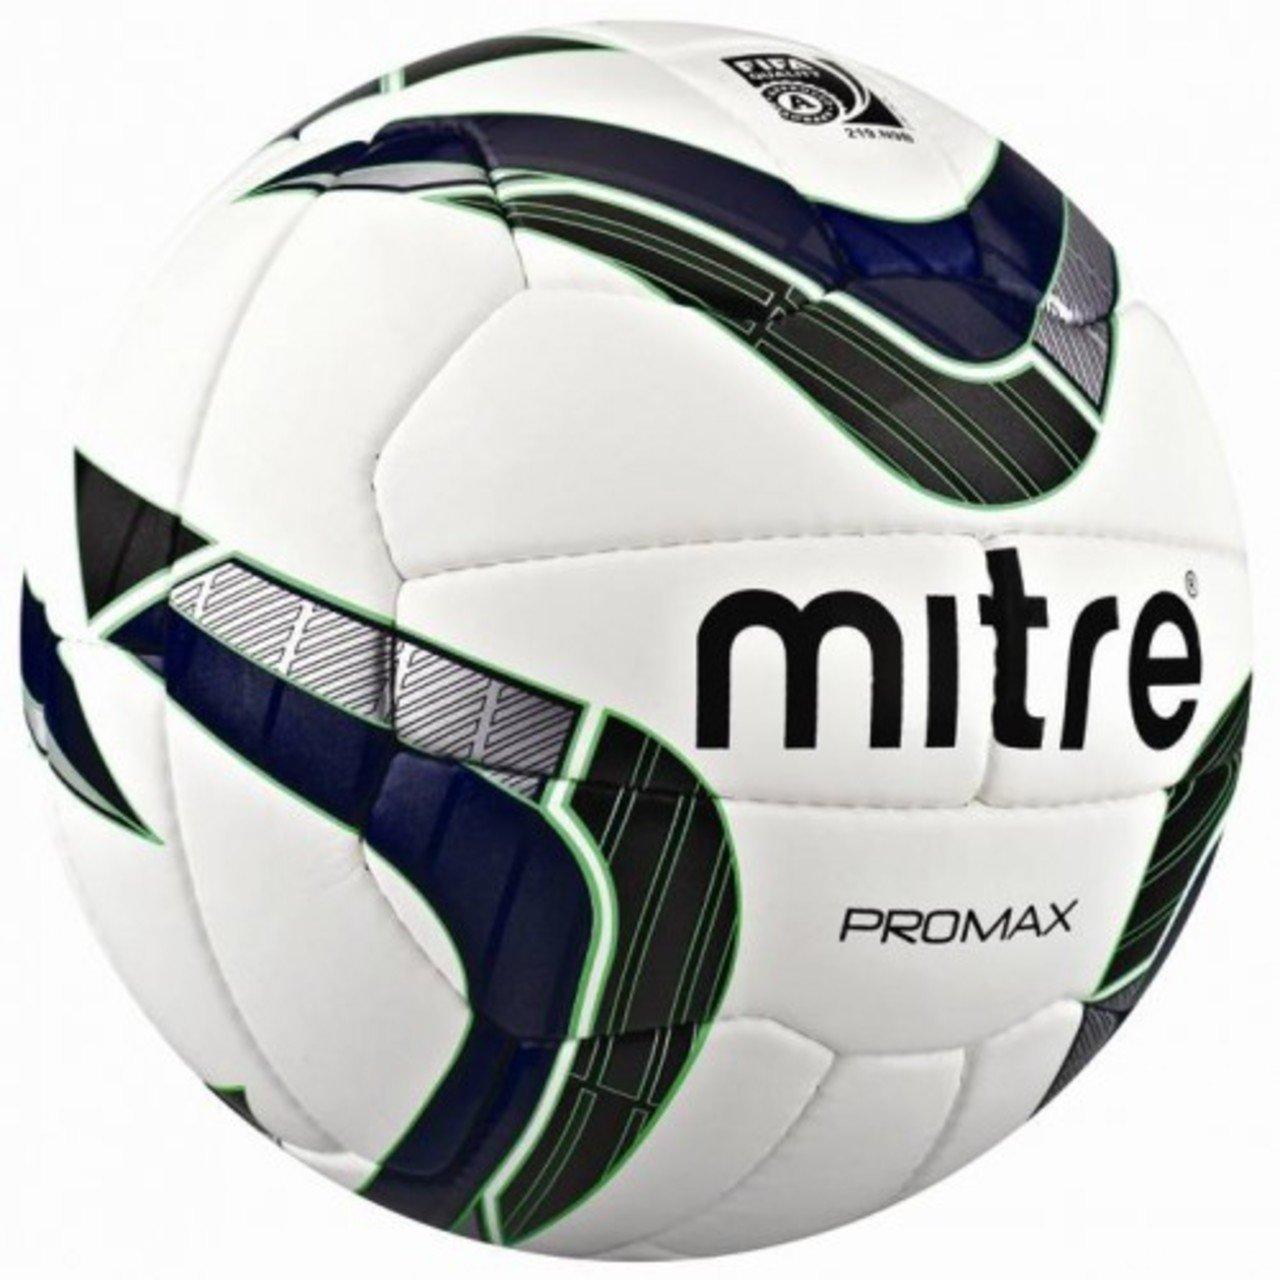 Mitre B4033 Pro Max Soccer Ball Size 5